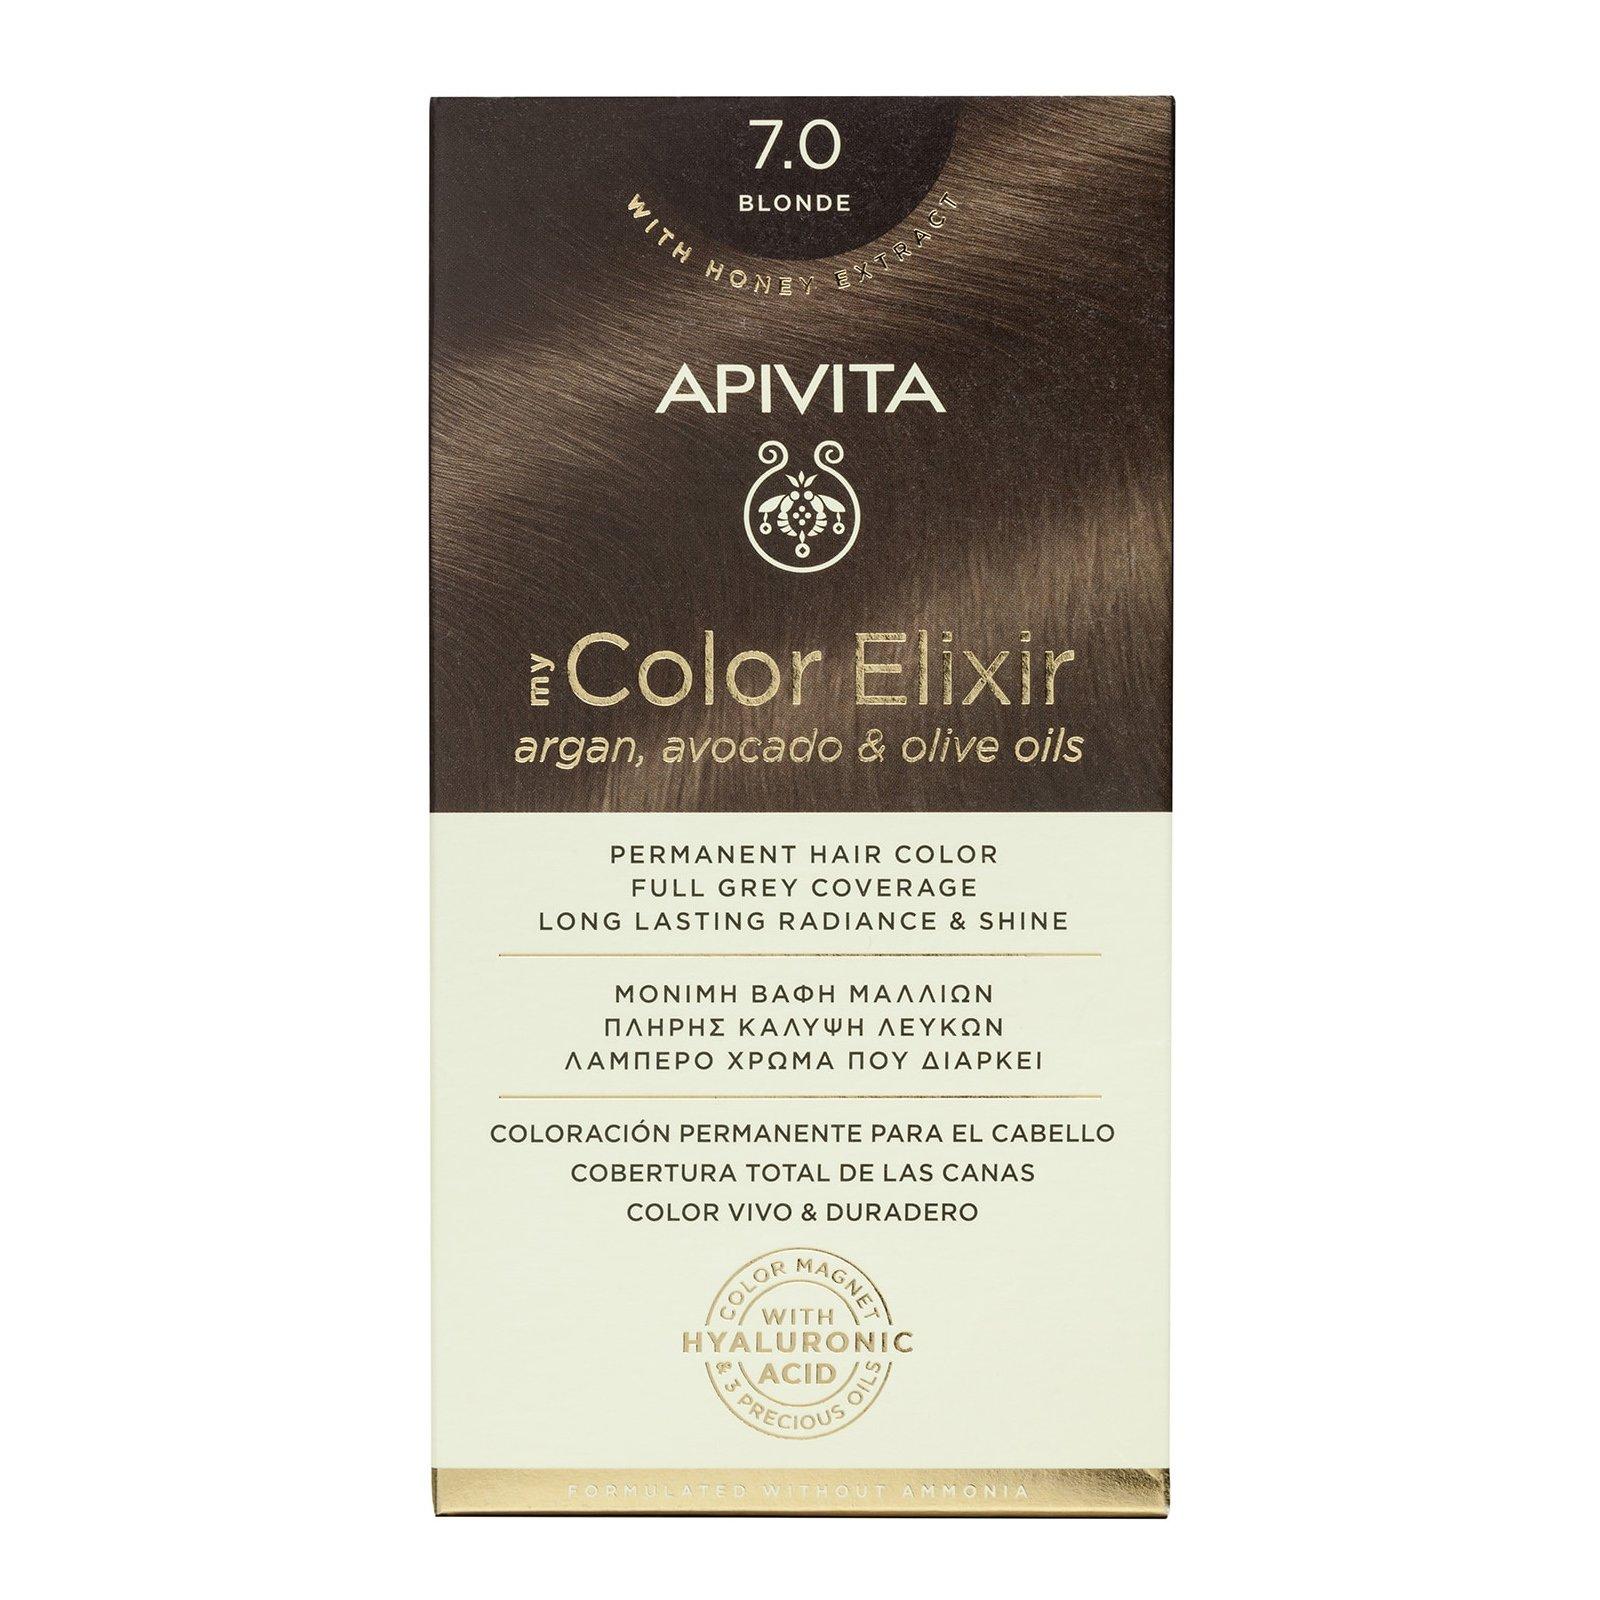 Apivita My Color Elixir Μόνιμη Βαφή Μαλλιών με Καινοτόμο Σύστημα Color Magnet που Σταθεροποιεί και Σφραγίζει το Χρώμα στην Τρίχα – N7.0 ΦΥΣΙΚΟ ΞΑΝΘΟ